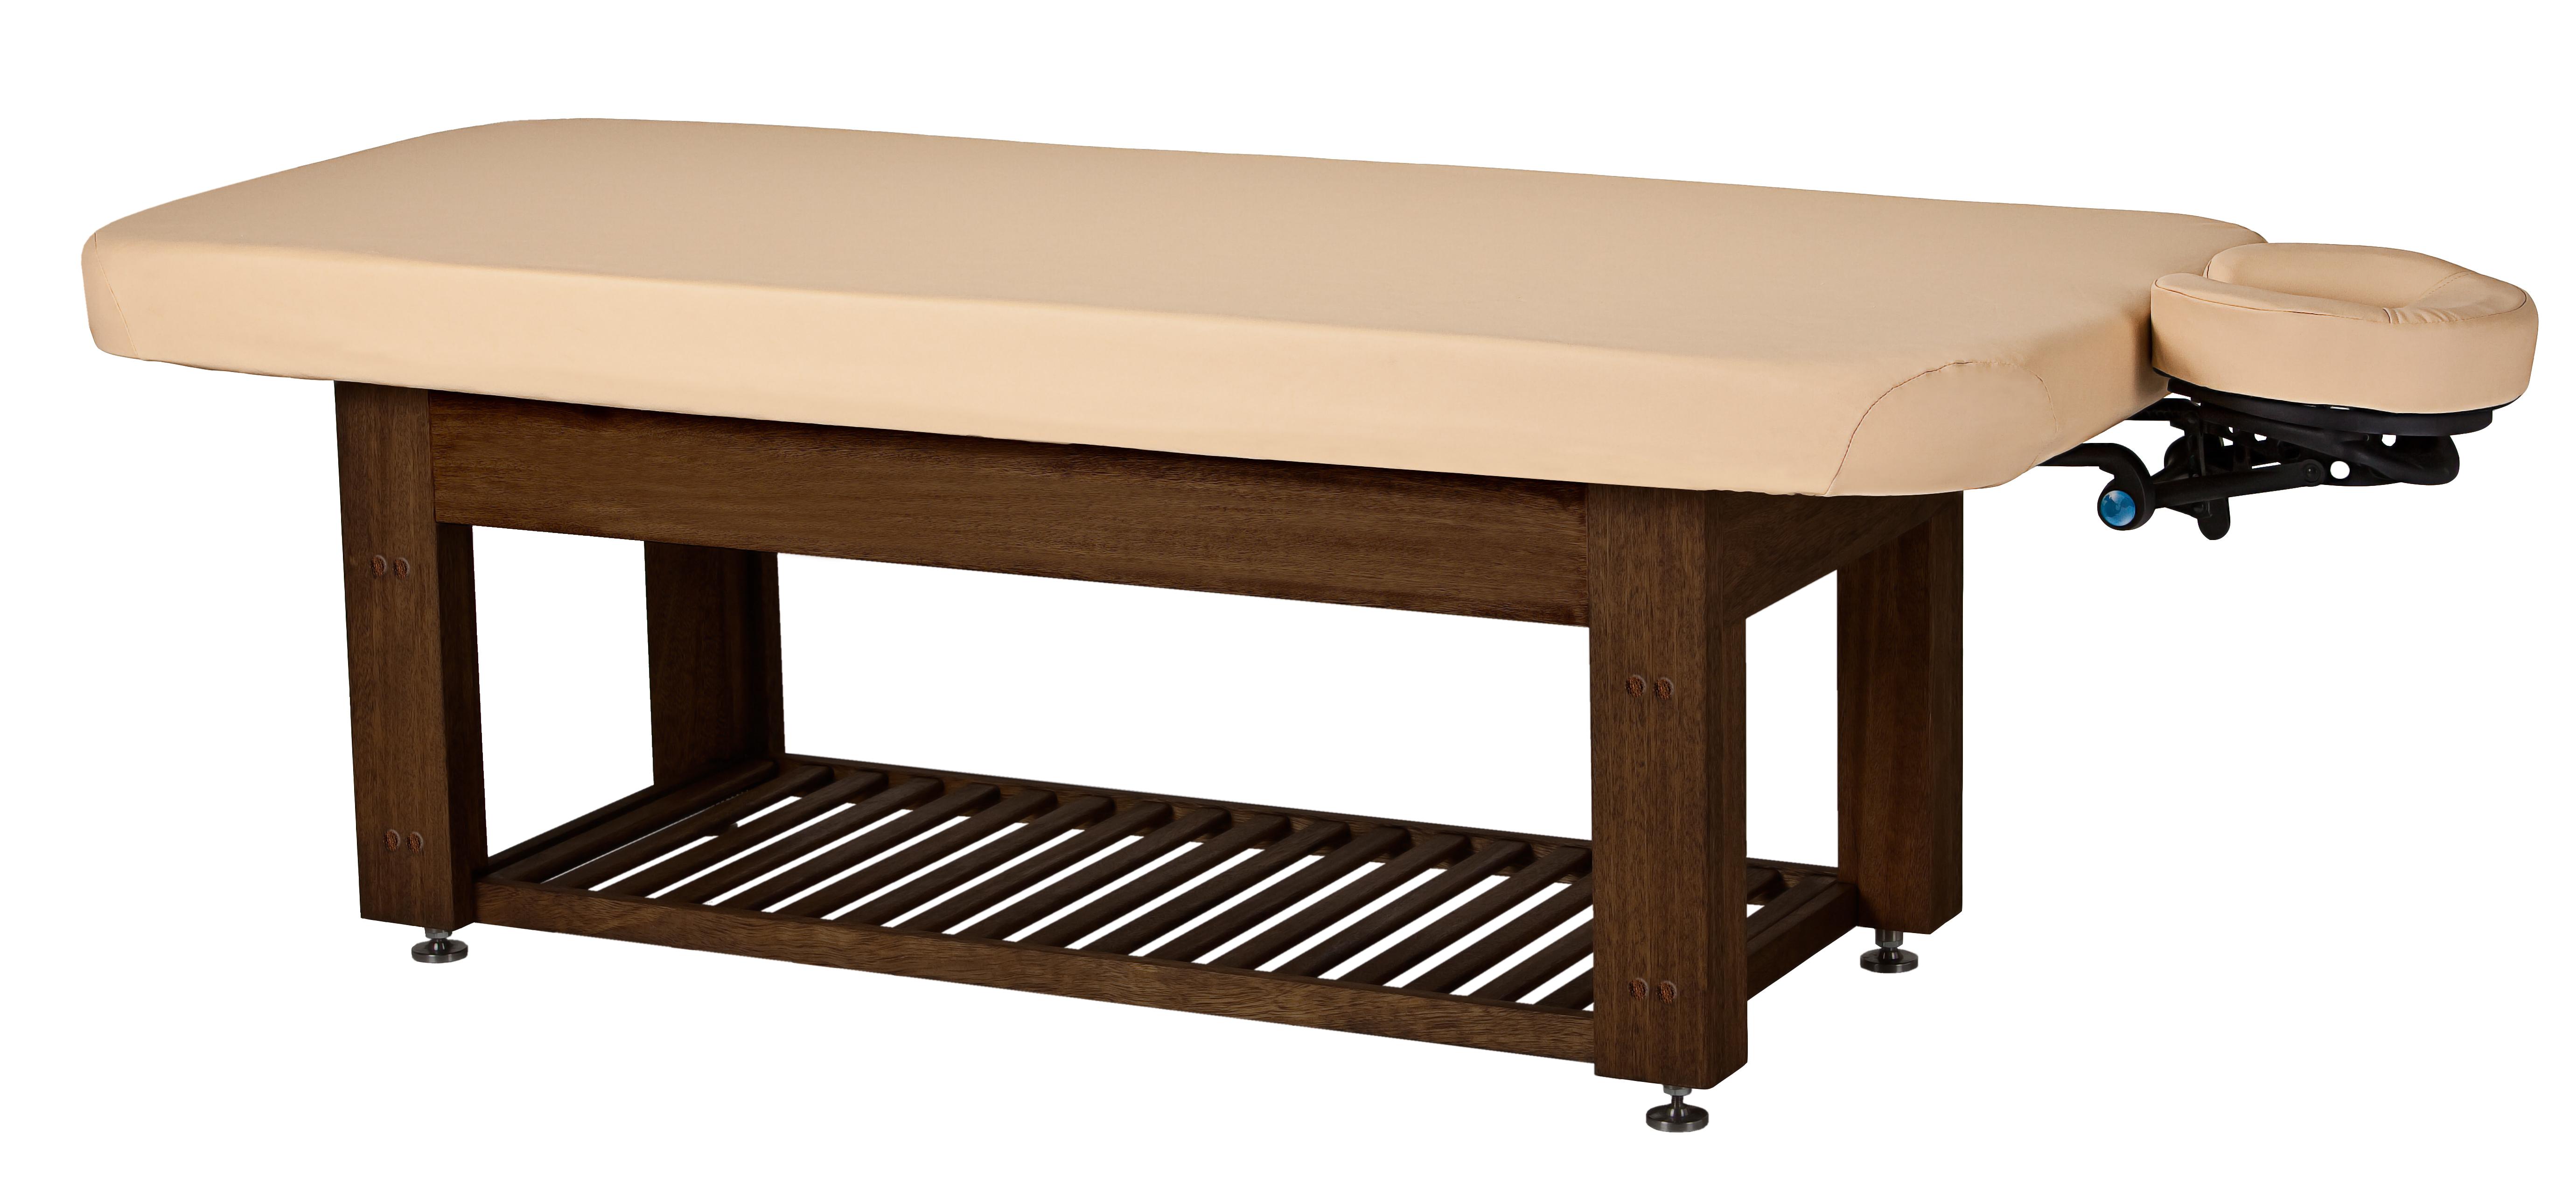 Napa La Mer Spa And Salon Table Teak Base U2013 Massage Tables | Massage Beds |  Spa Tables | Massage Supplies